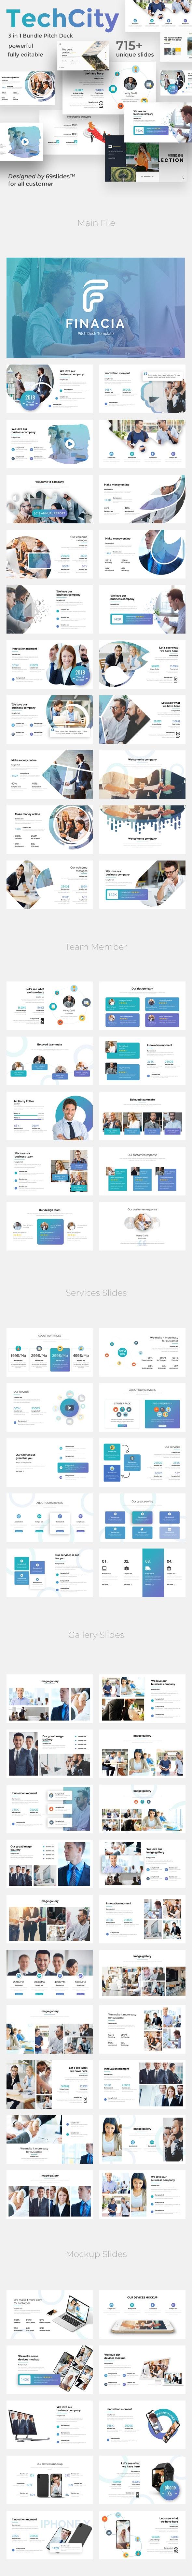 Techcity 3 in 1 Pitch Deck Bundle Google Slide Template - Google Slides Presentation Templates